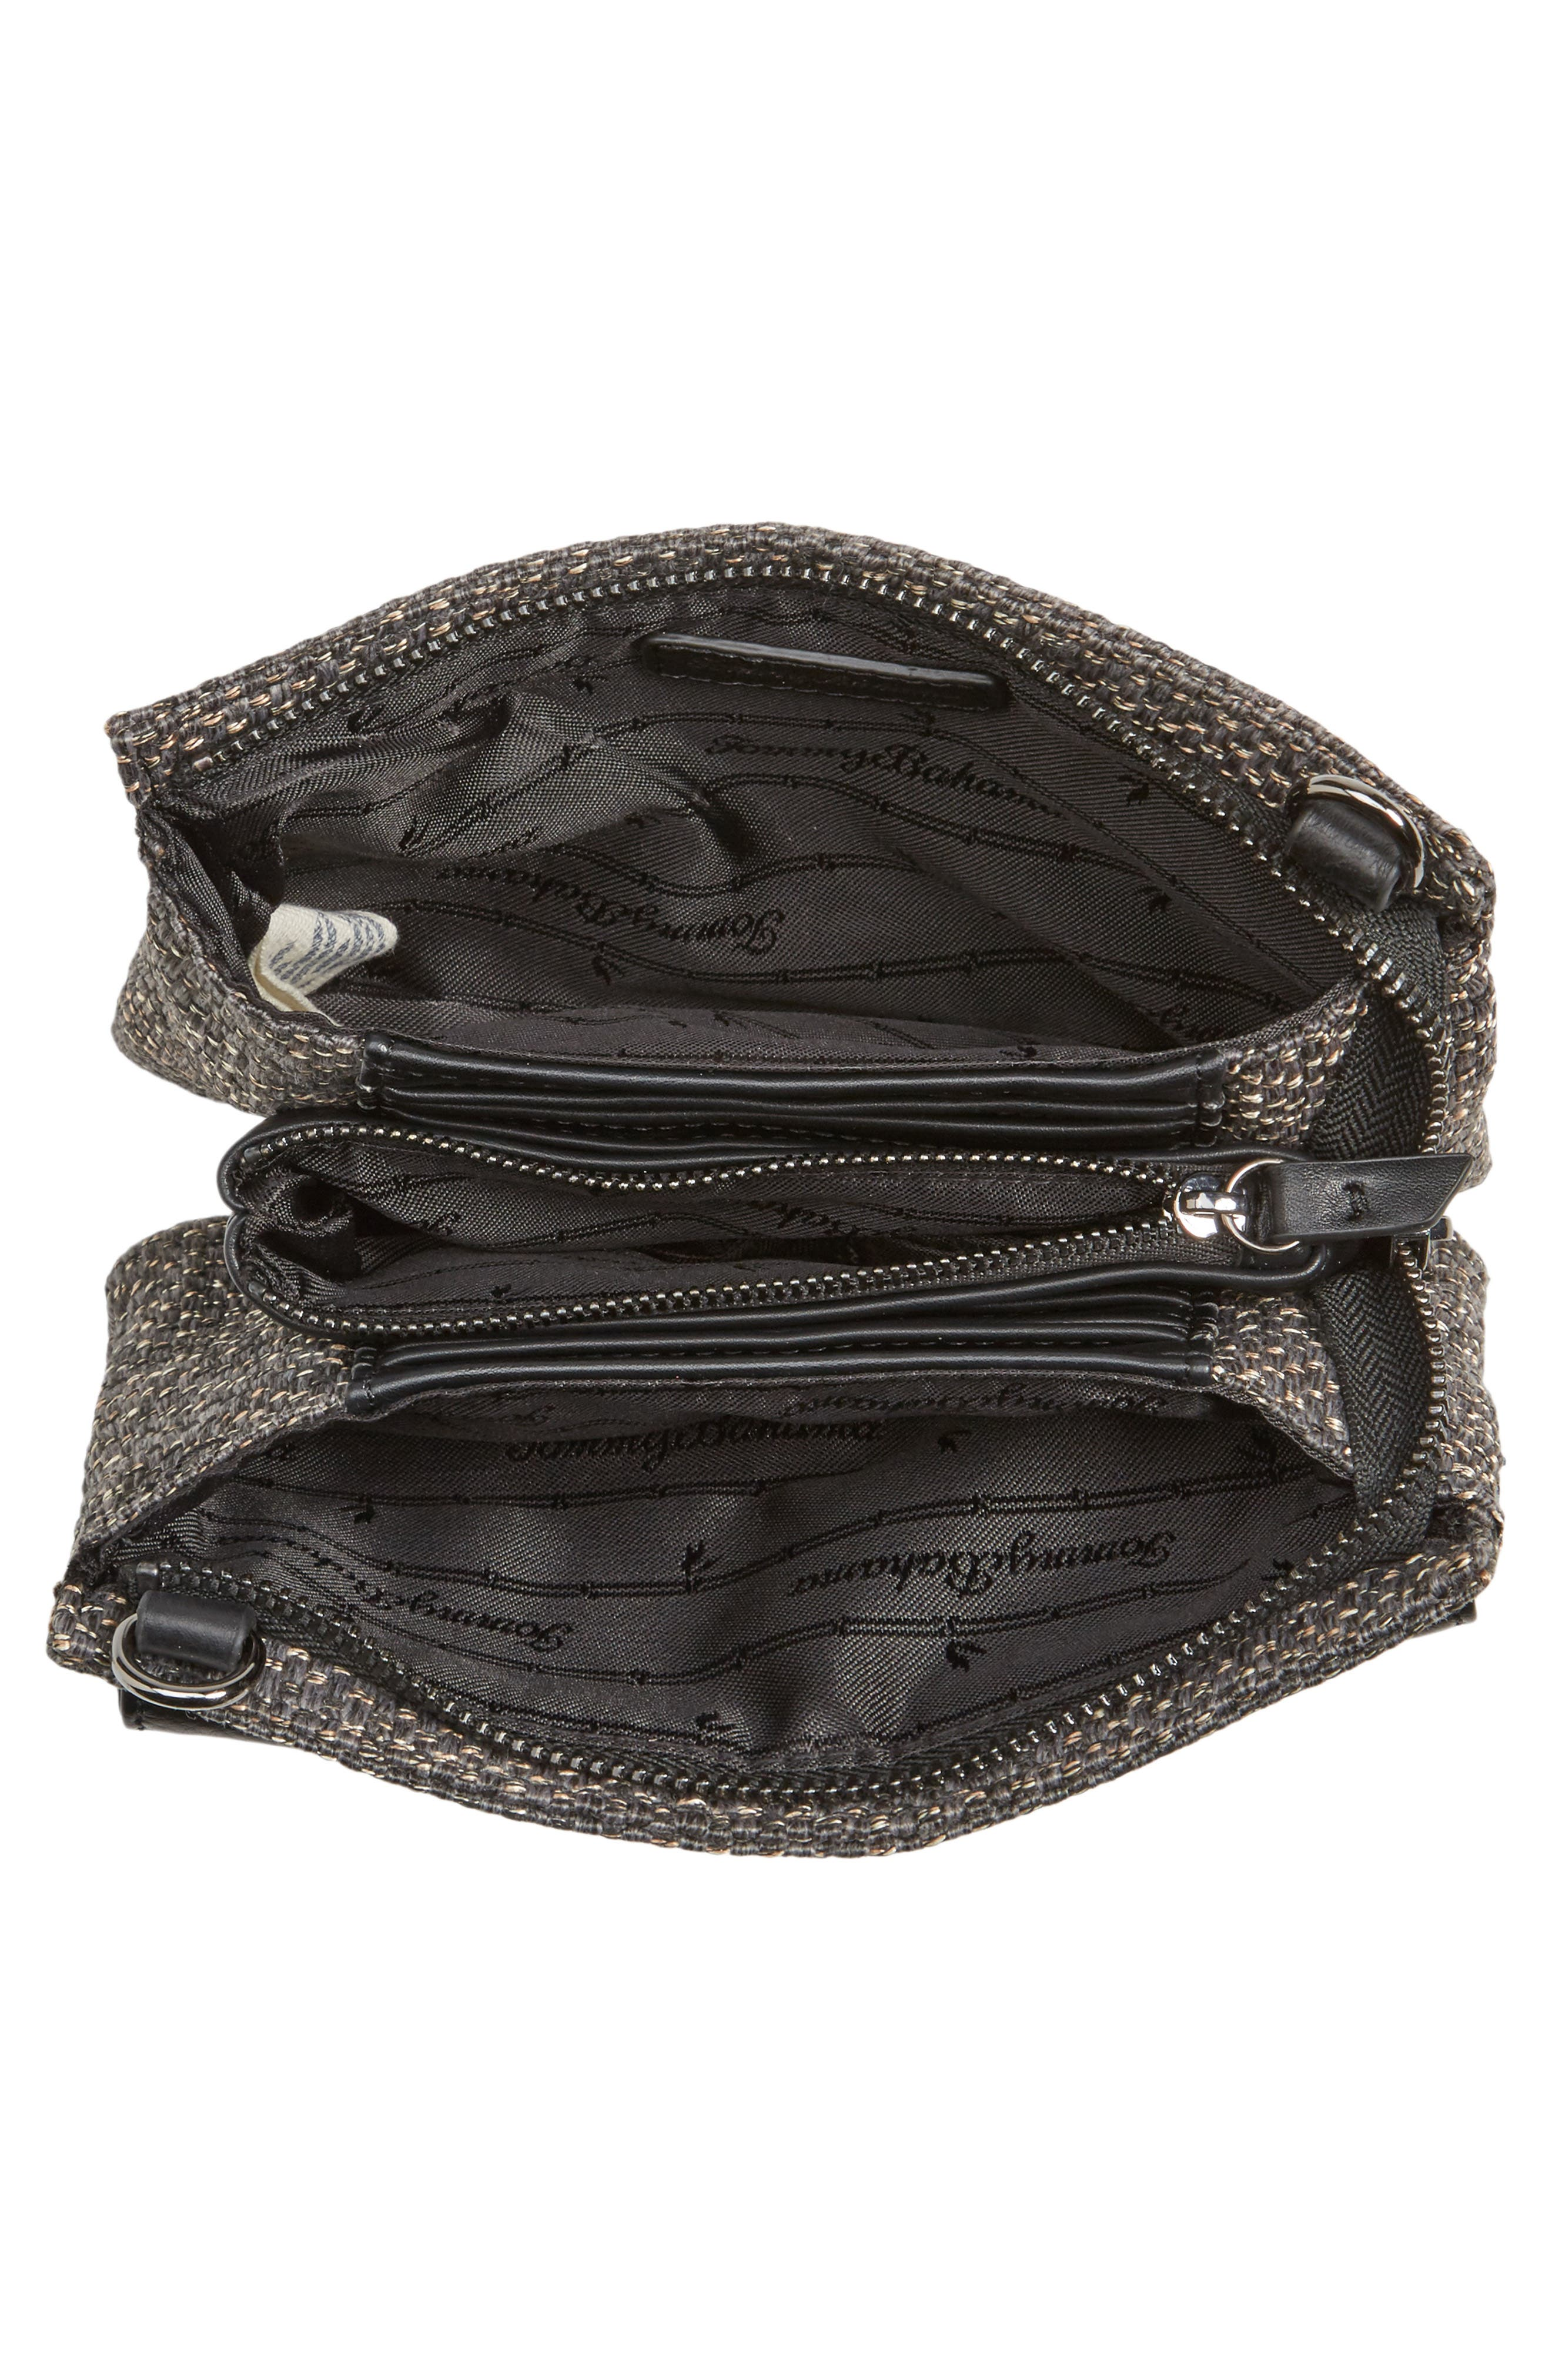 Katerini Leather Crossbody Wallet,                             Alternate thumbnail 22, color,